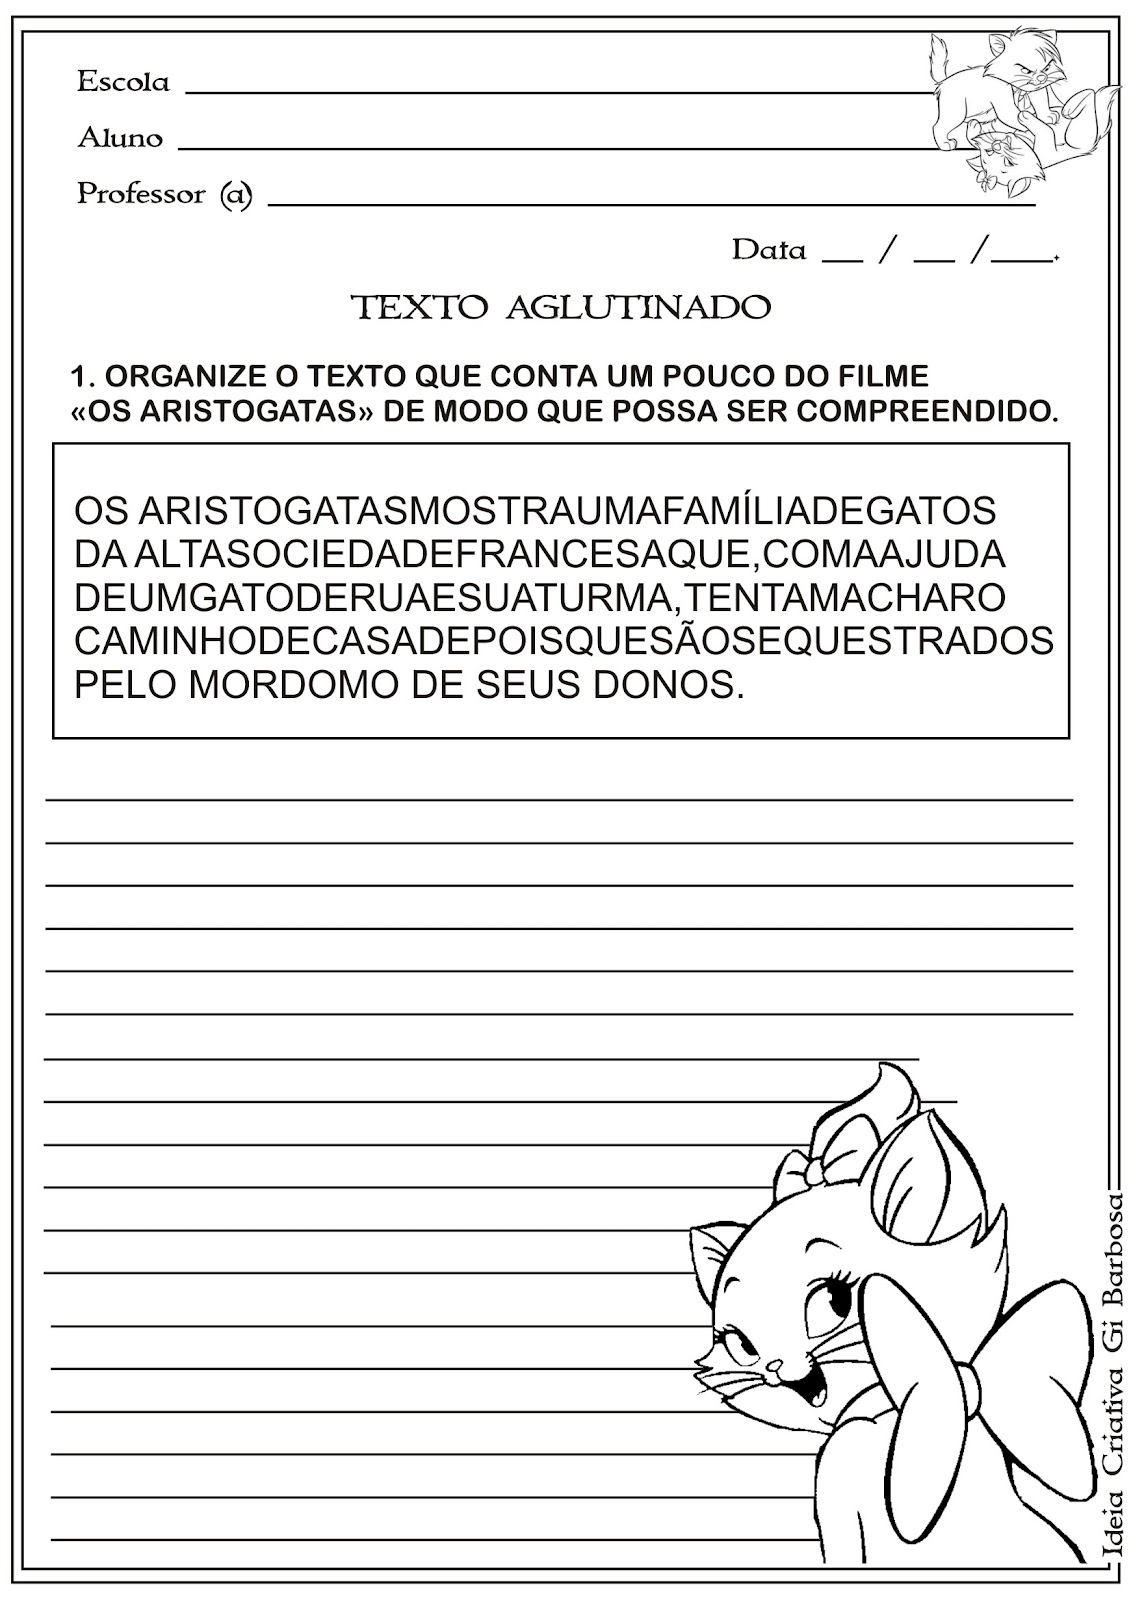 Texto Aglutinado - Filme OS Aristogatas